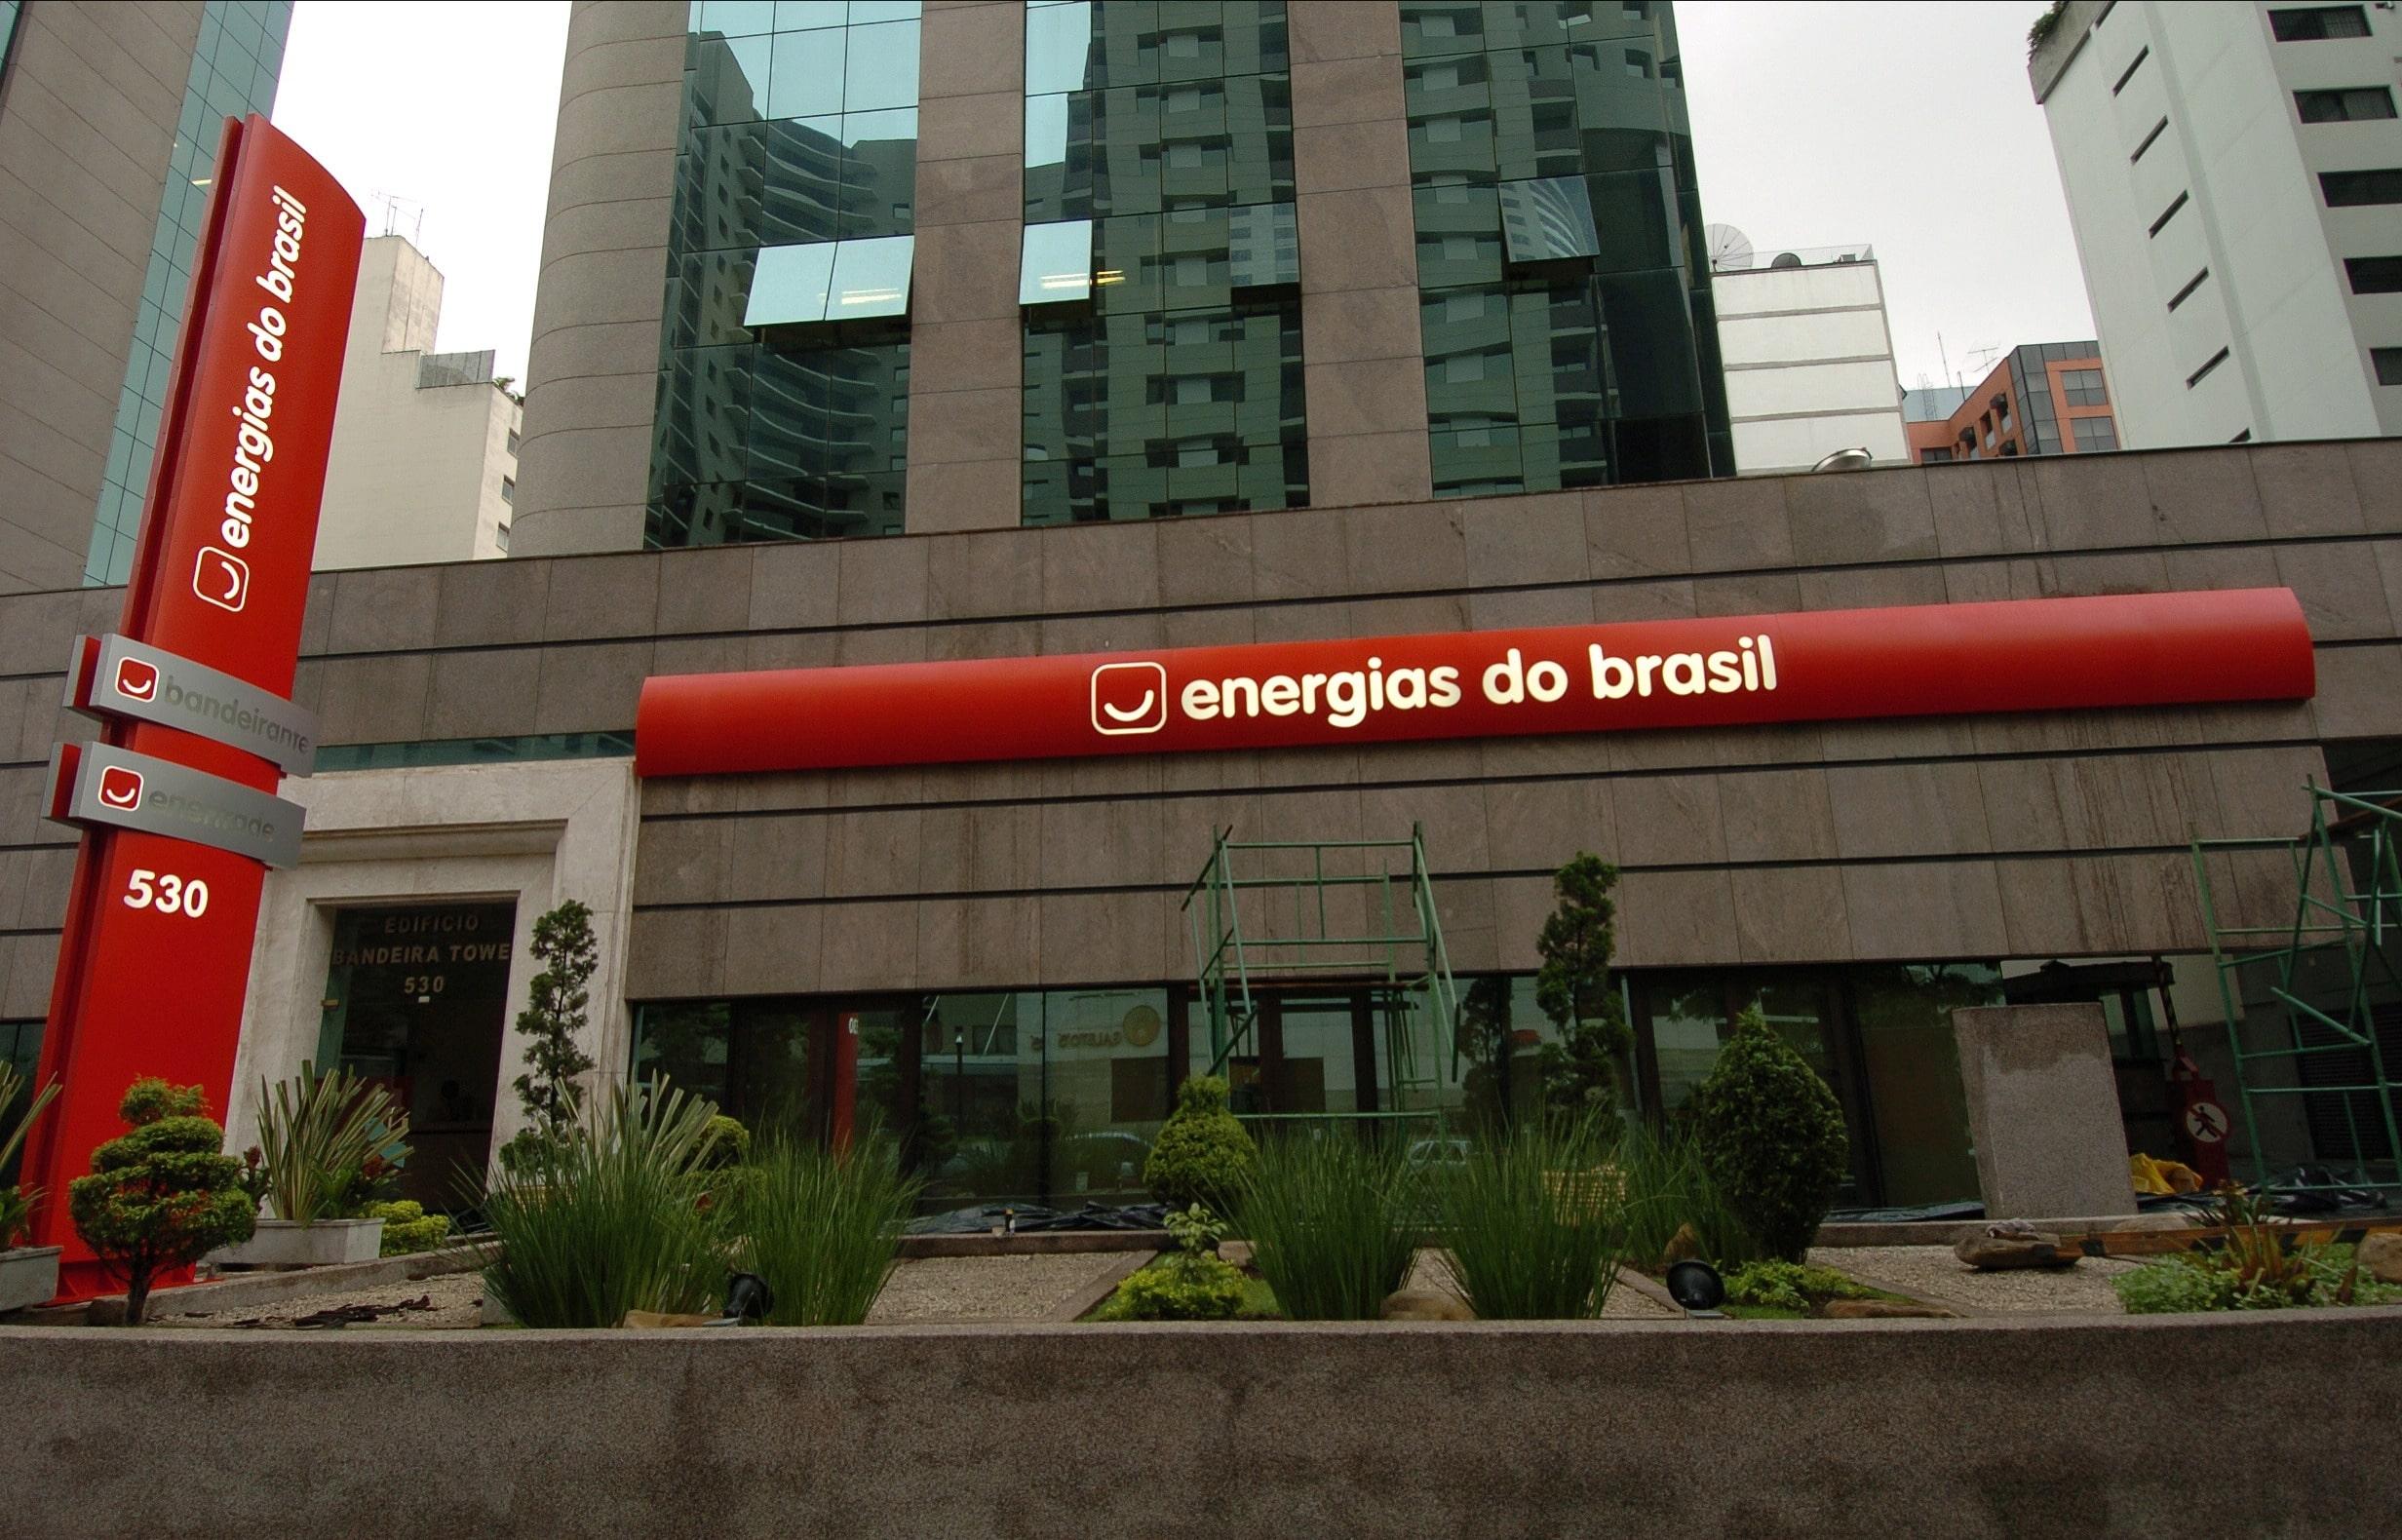 Energias do Brasil - ENBR3